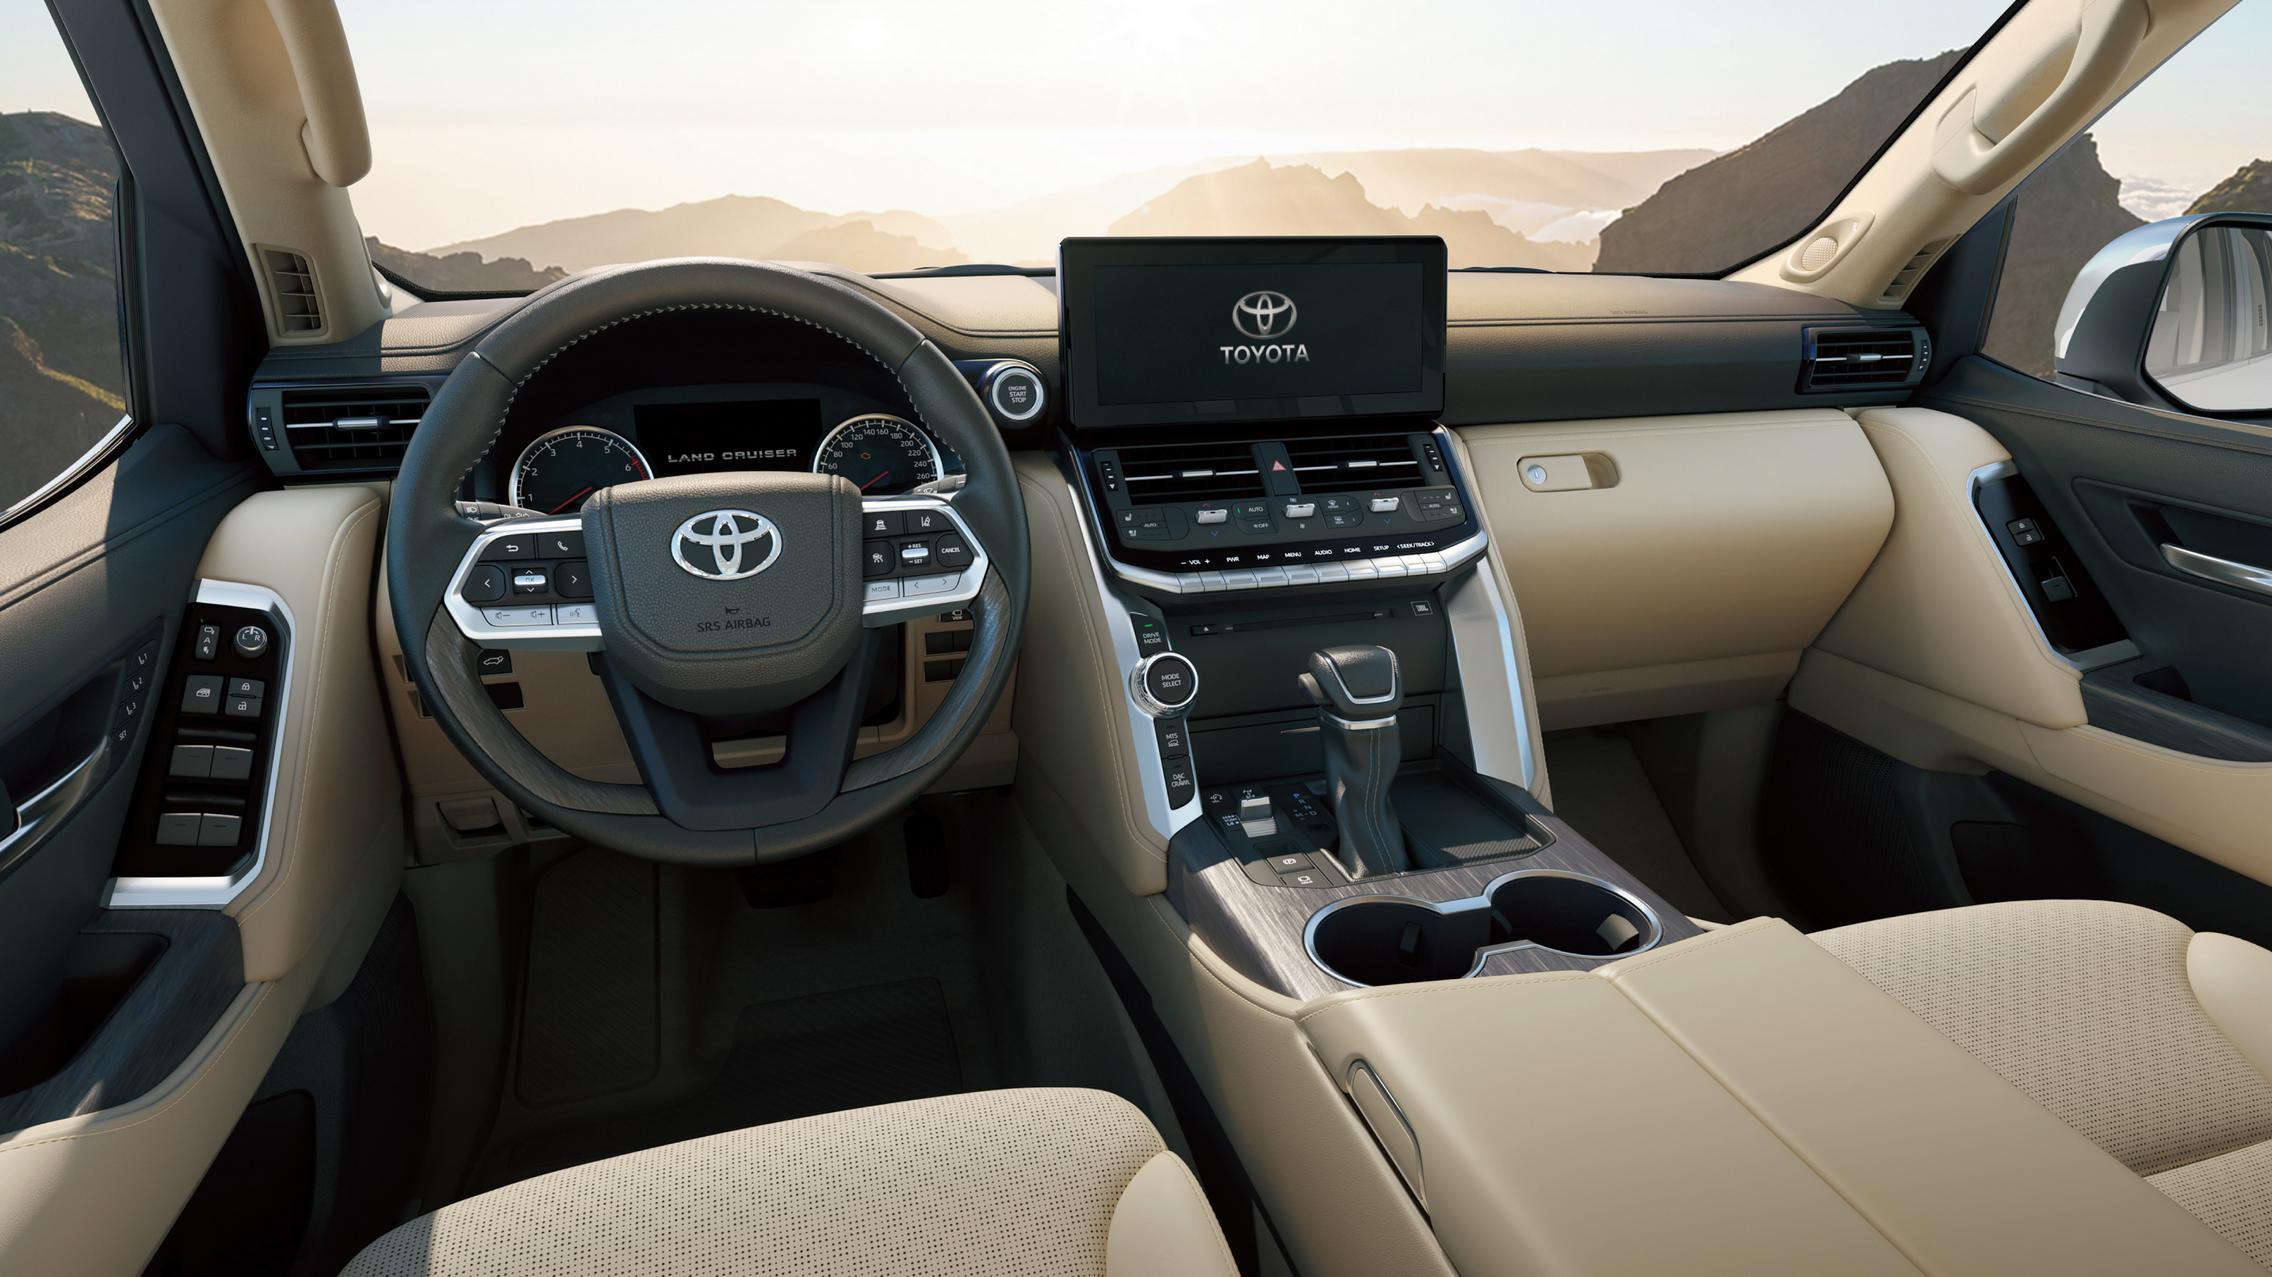 Land Cruiser 300 interior